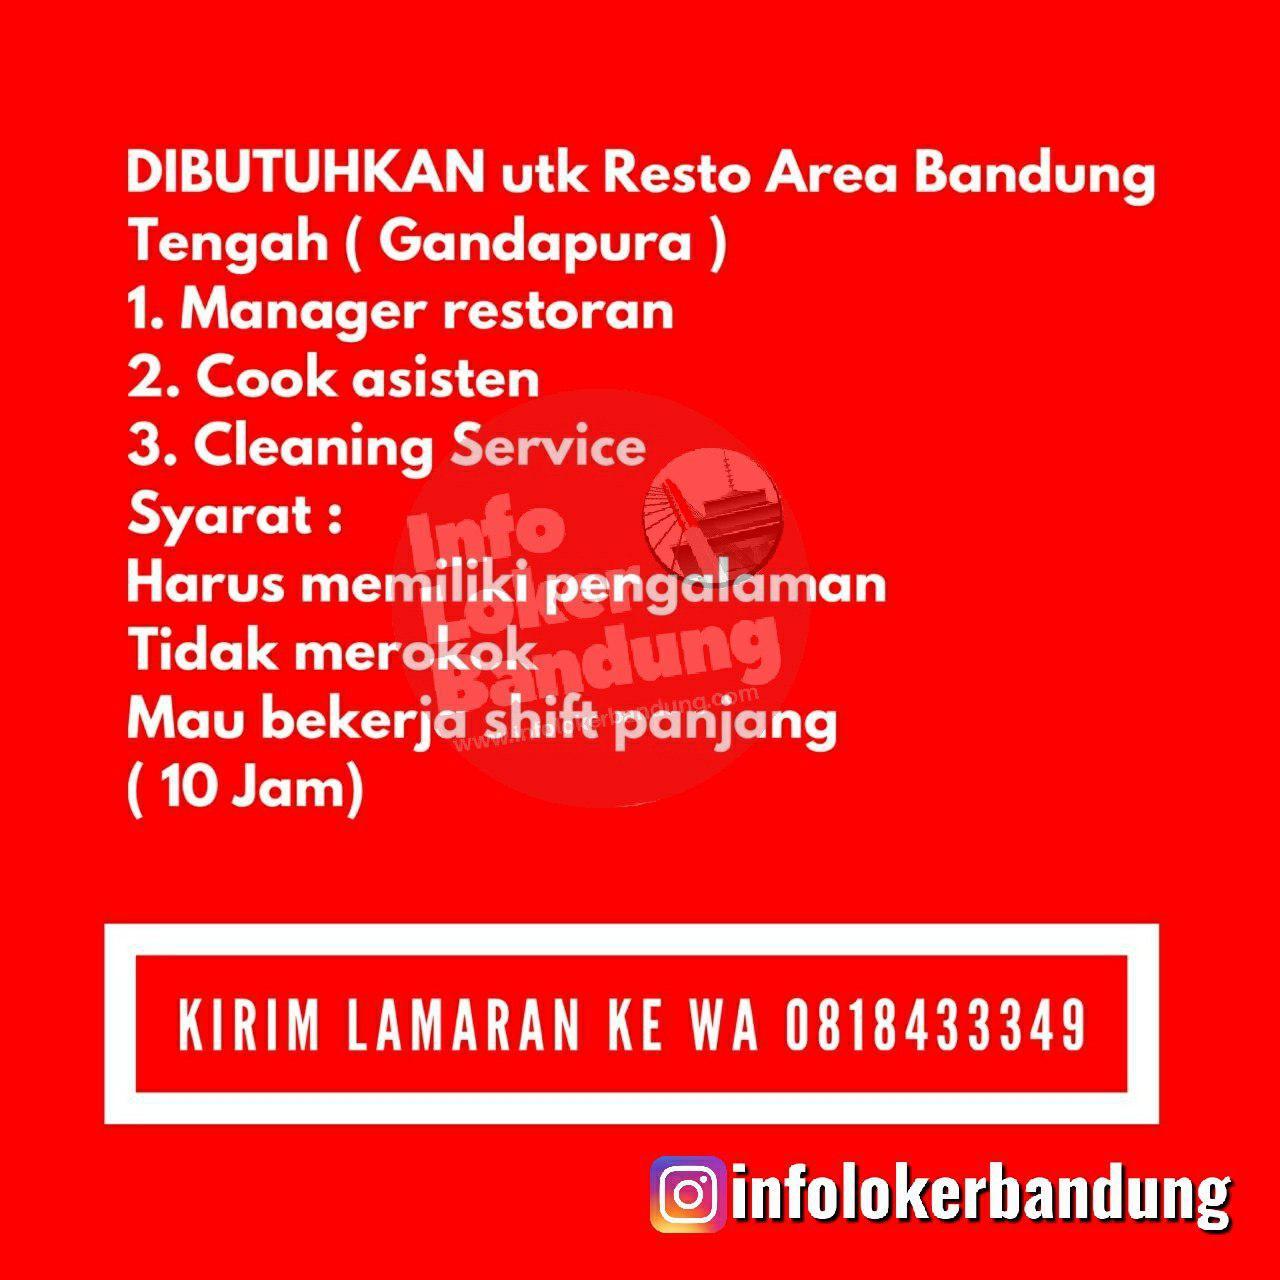 Lowongan Kerja Untuk Resto Area Bandung Tengah ( Gandapura ) Juli 2019